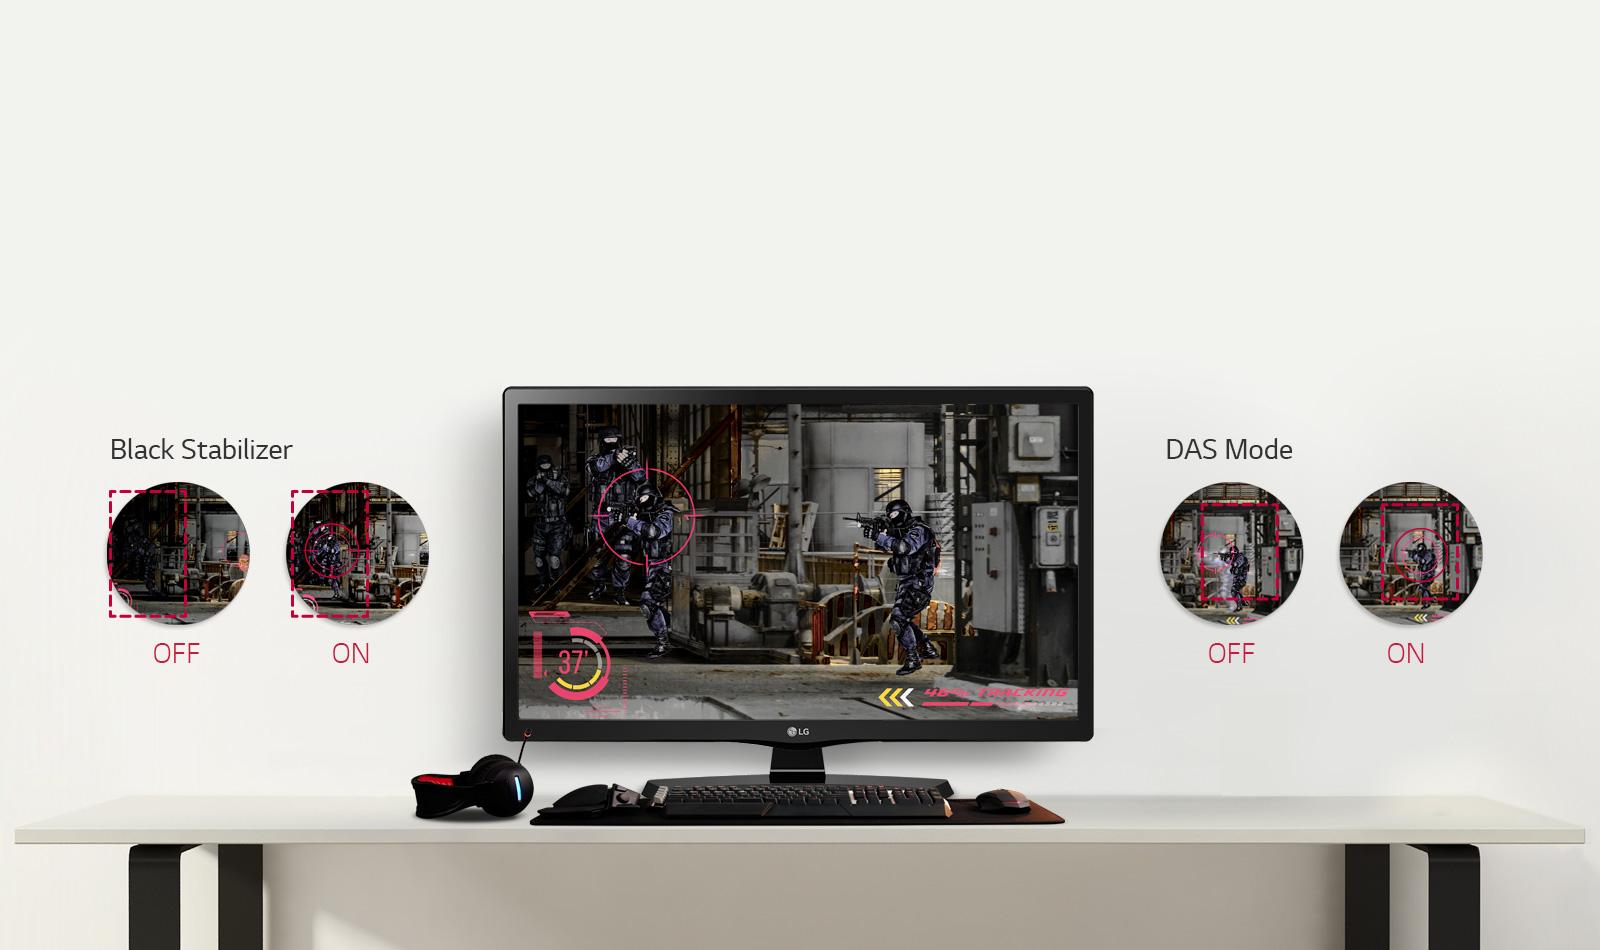 تلویزیون ال جی 28 اینچ mt48vf